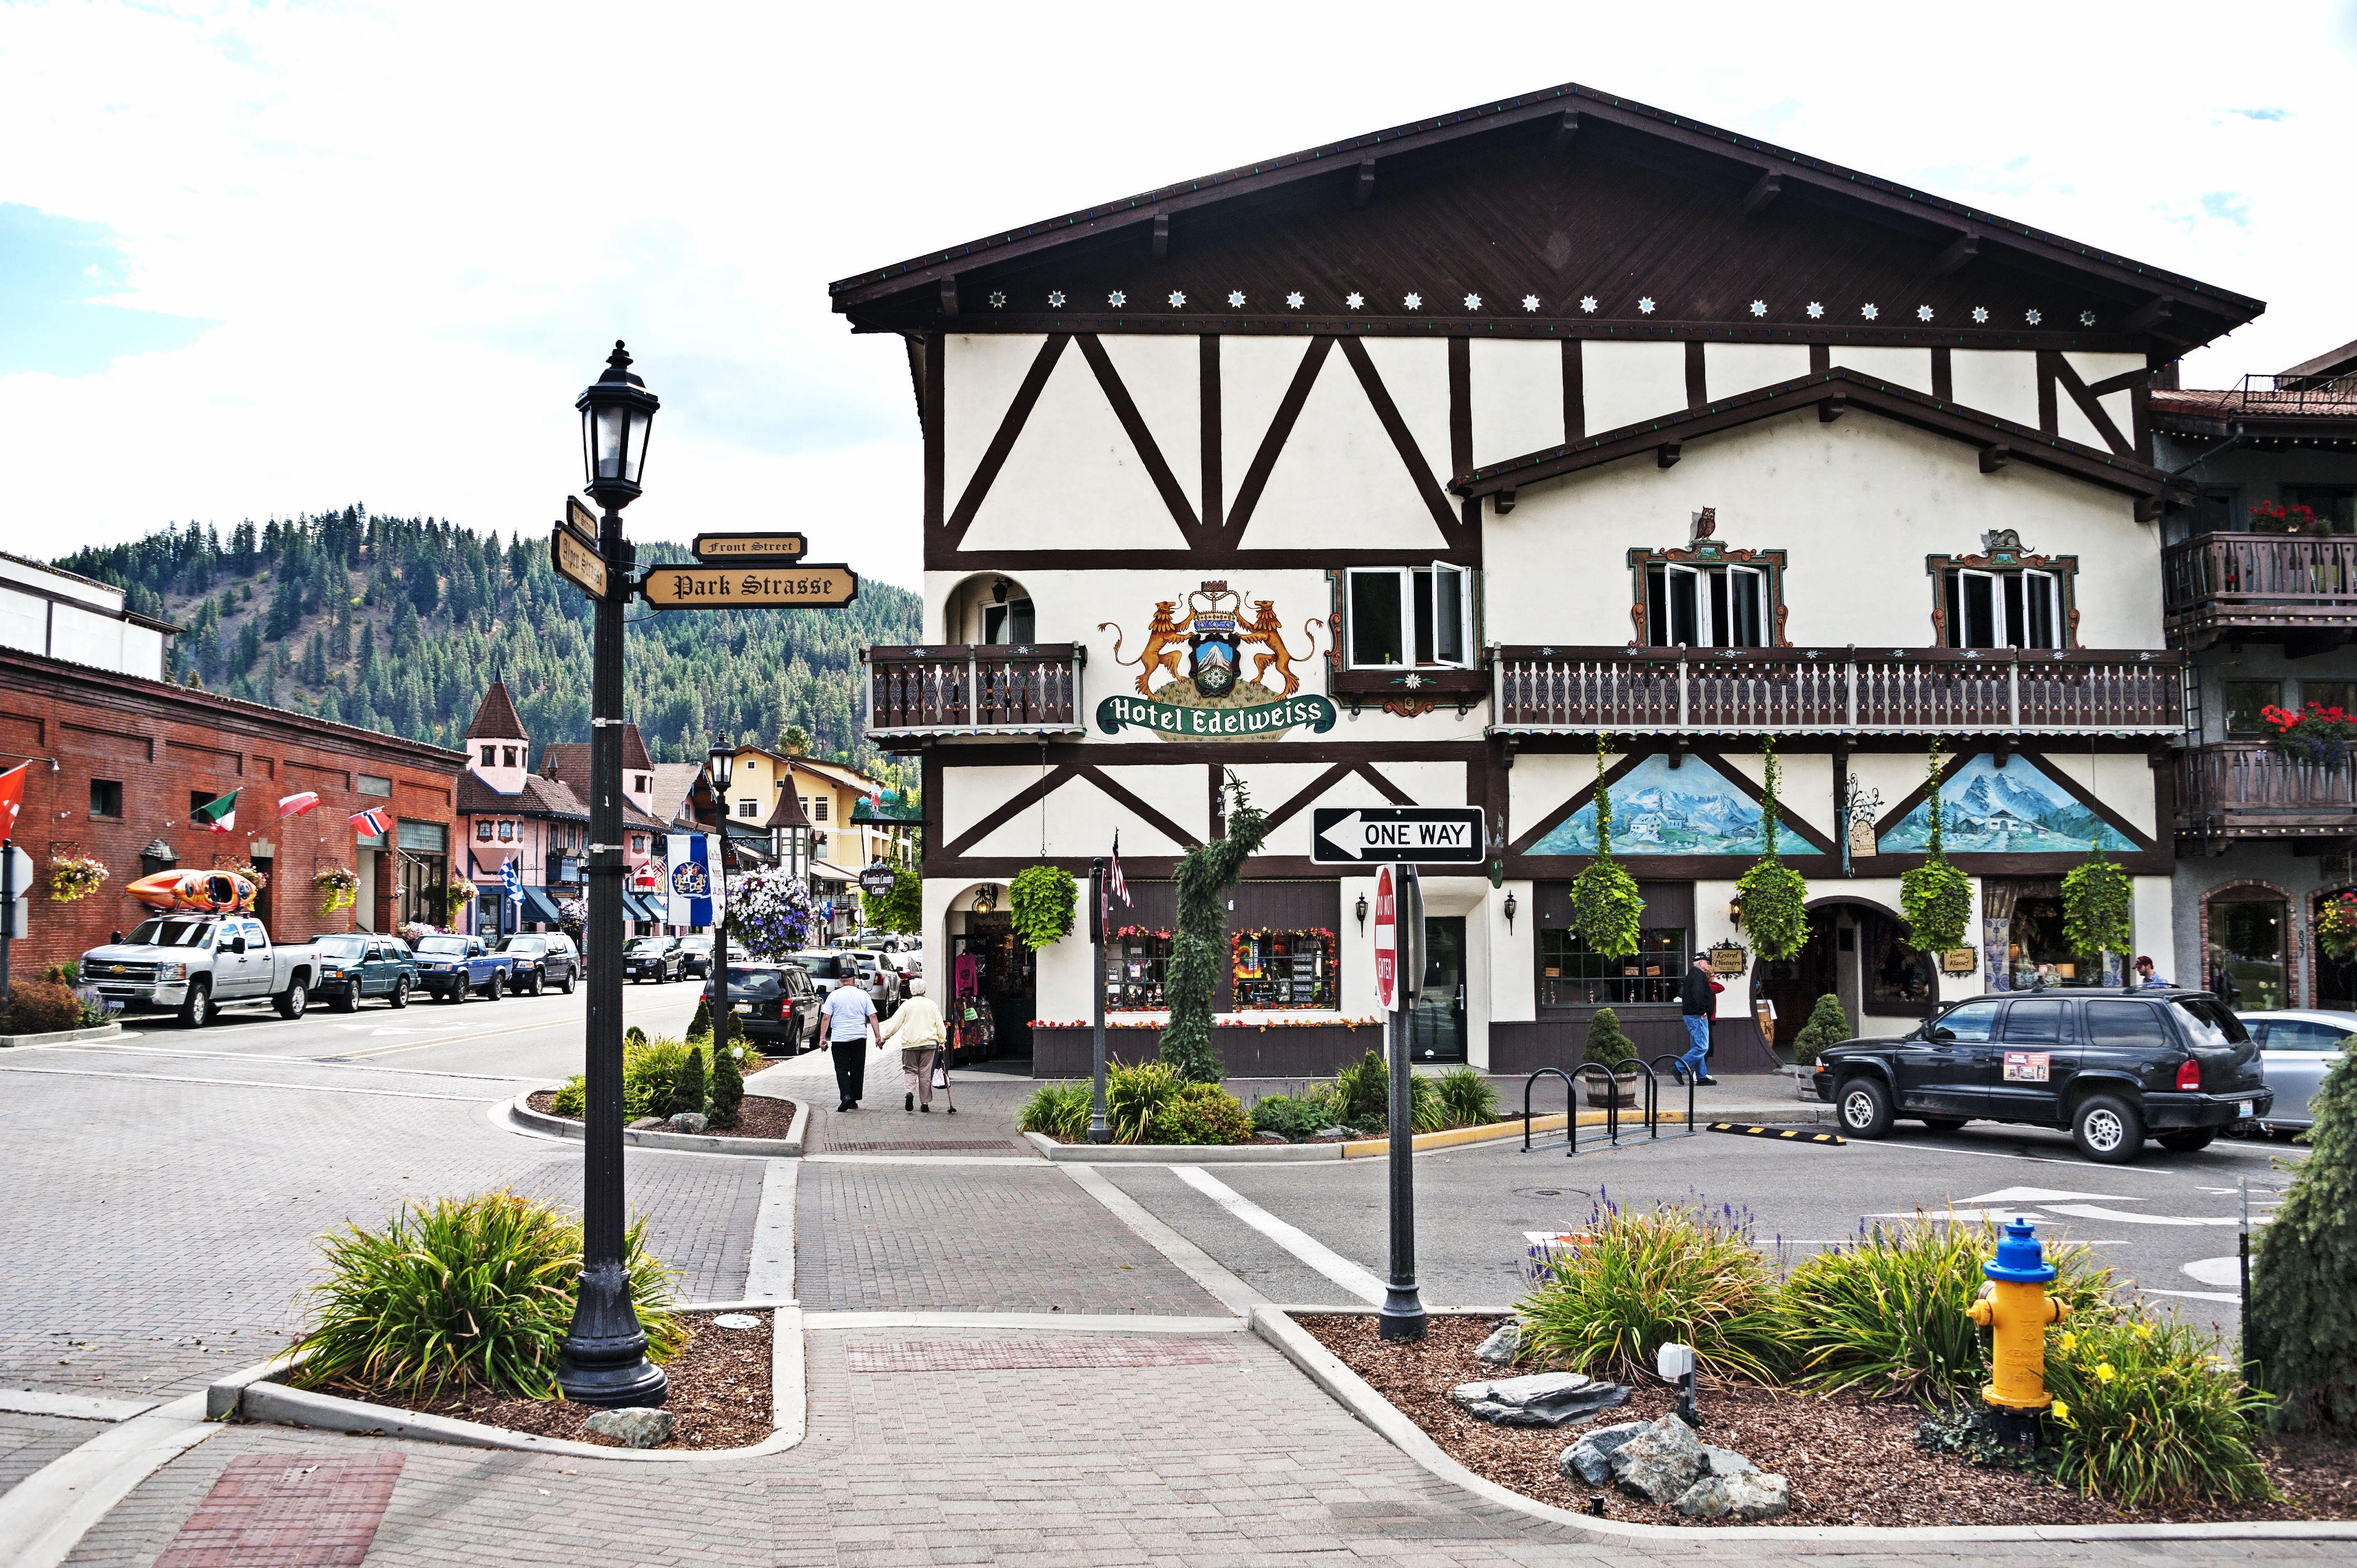 Hotel Edelweiss in Leavenworth